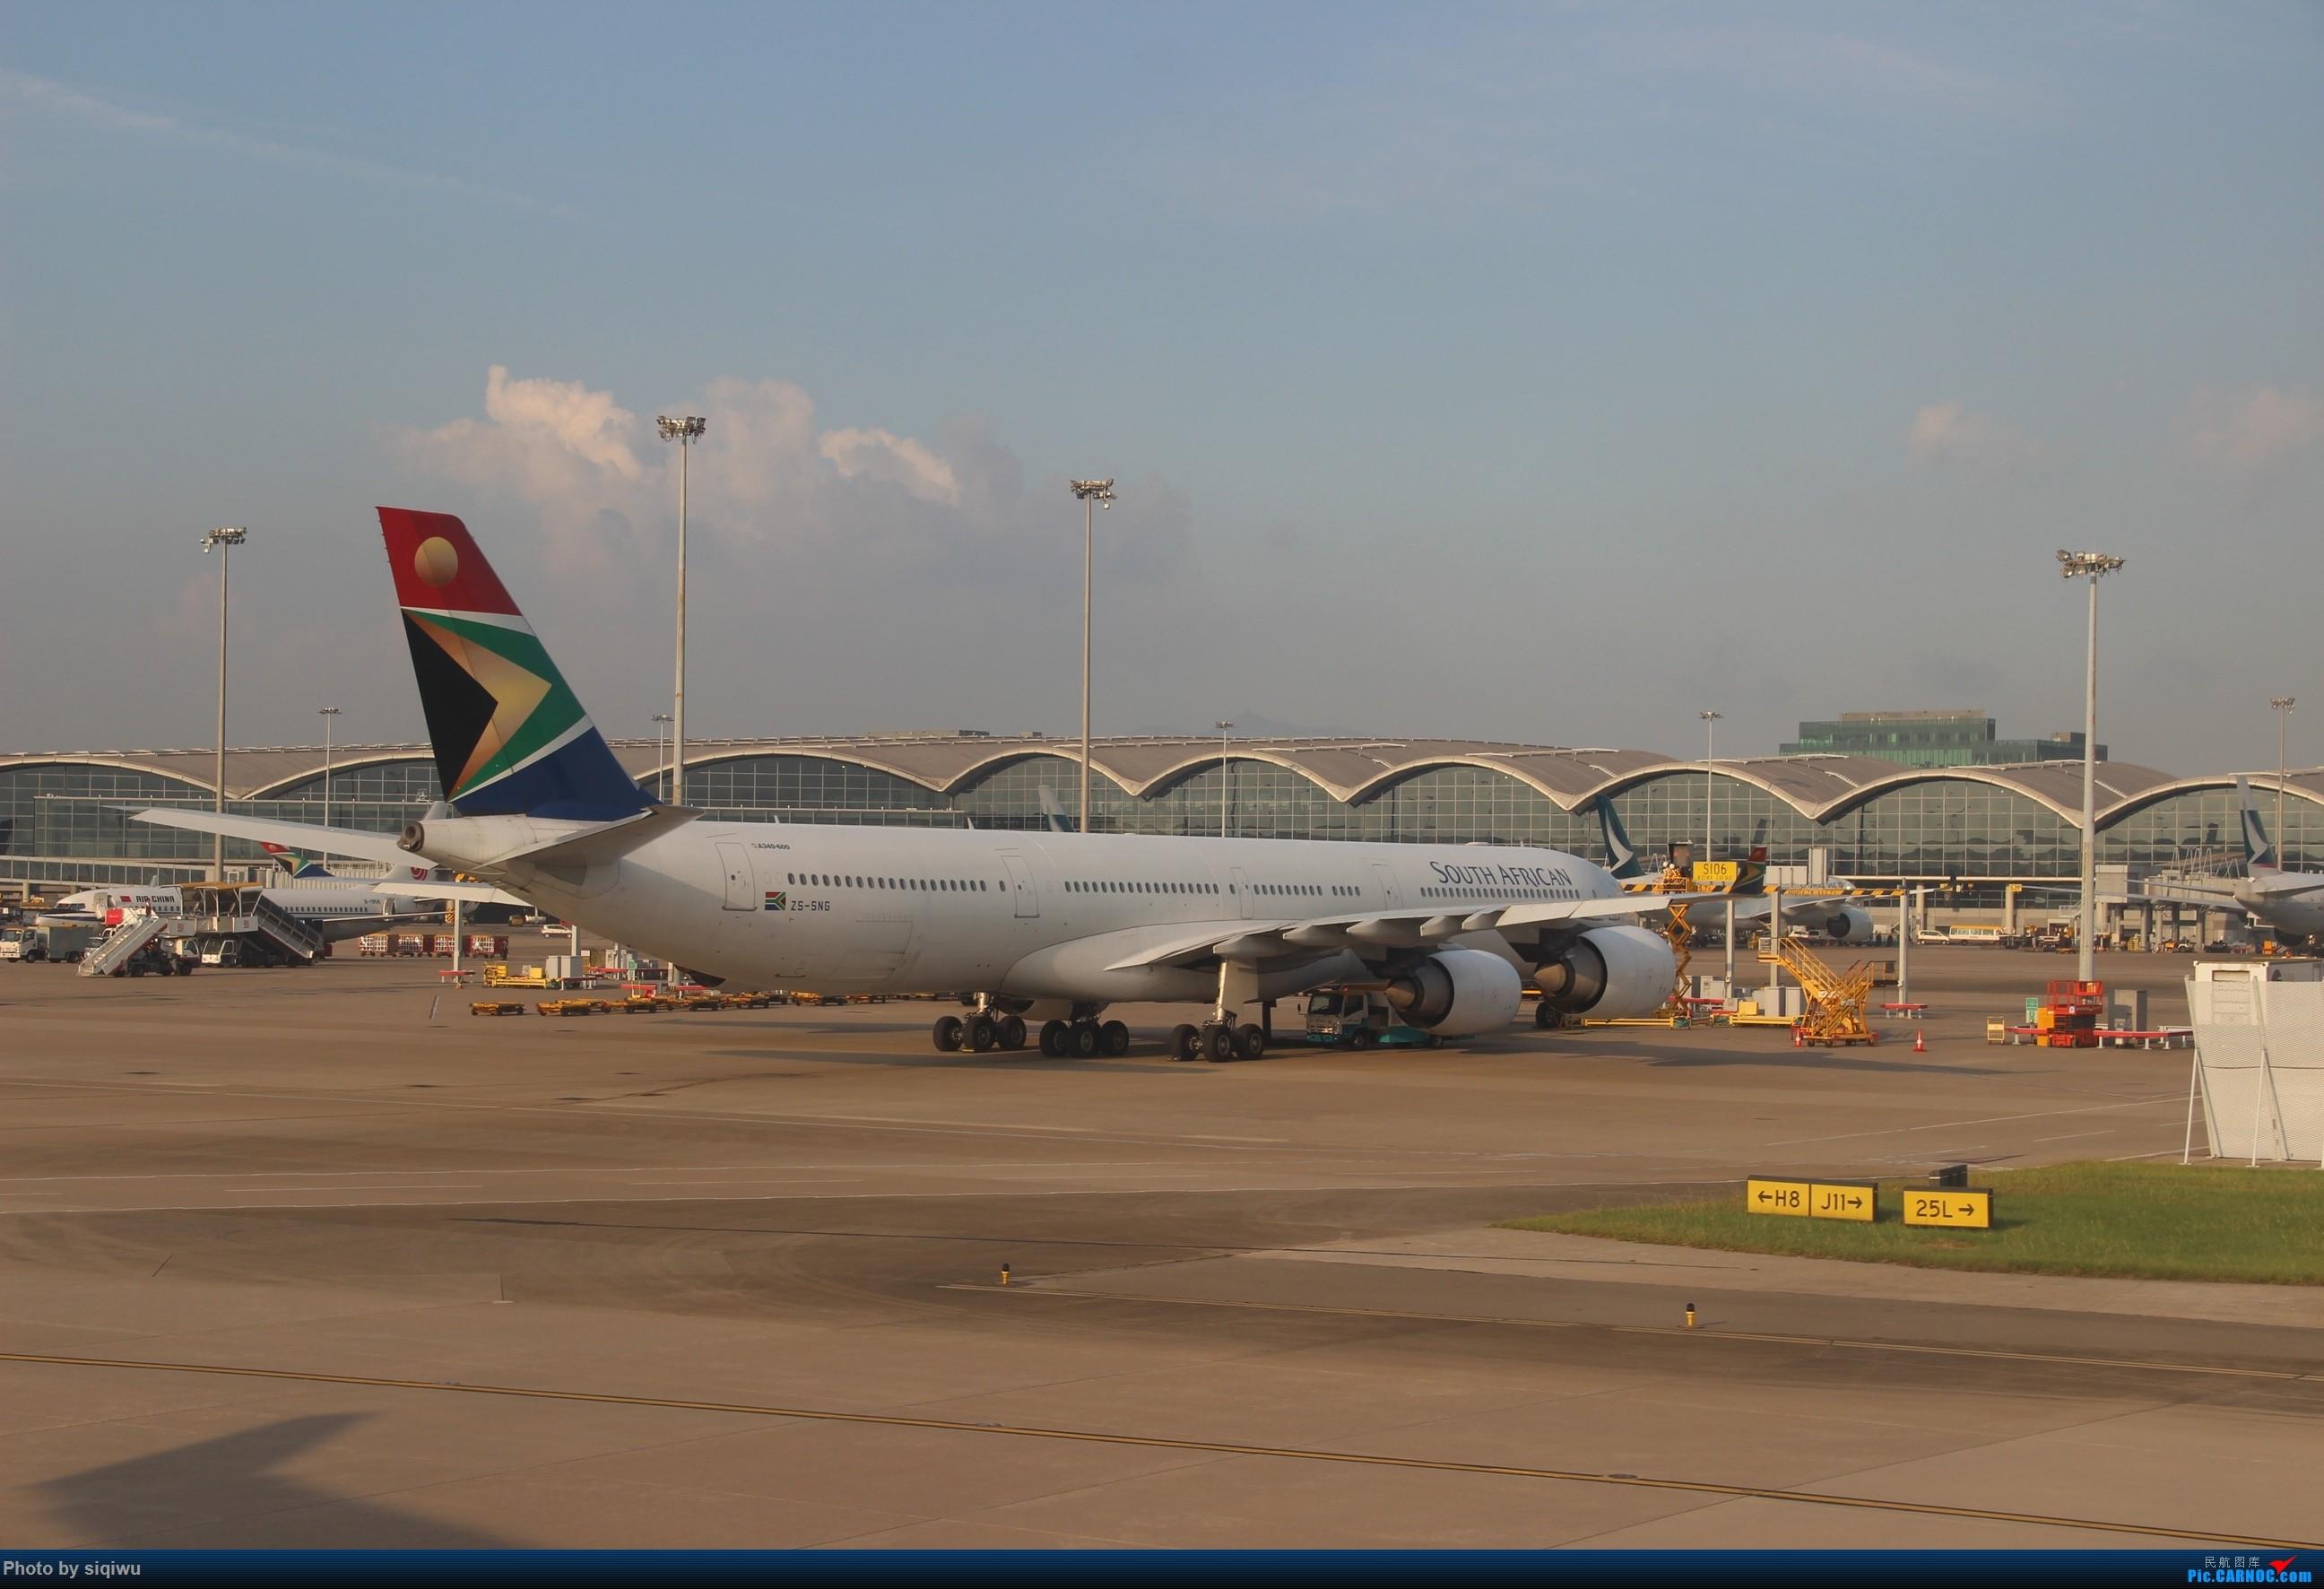 Re:[原创]PVG-HKG-KUL-HKG-PVG 四天往返,CX/KA AIRBUS A340-600  中国香港国际机场